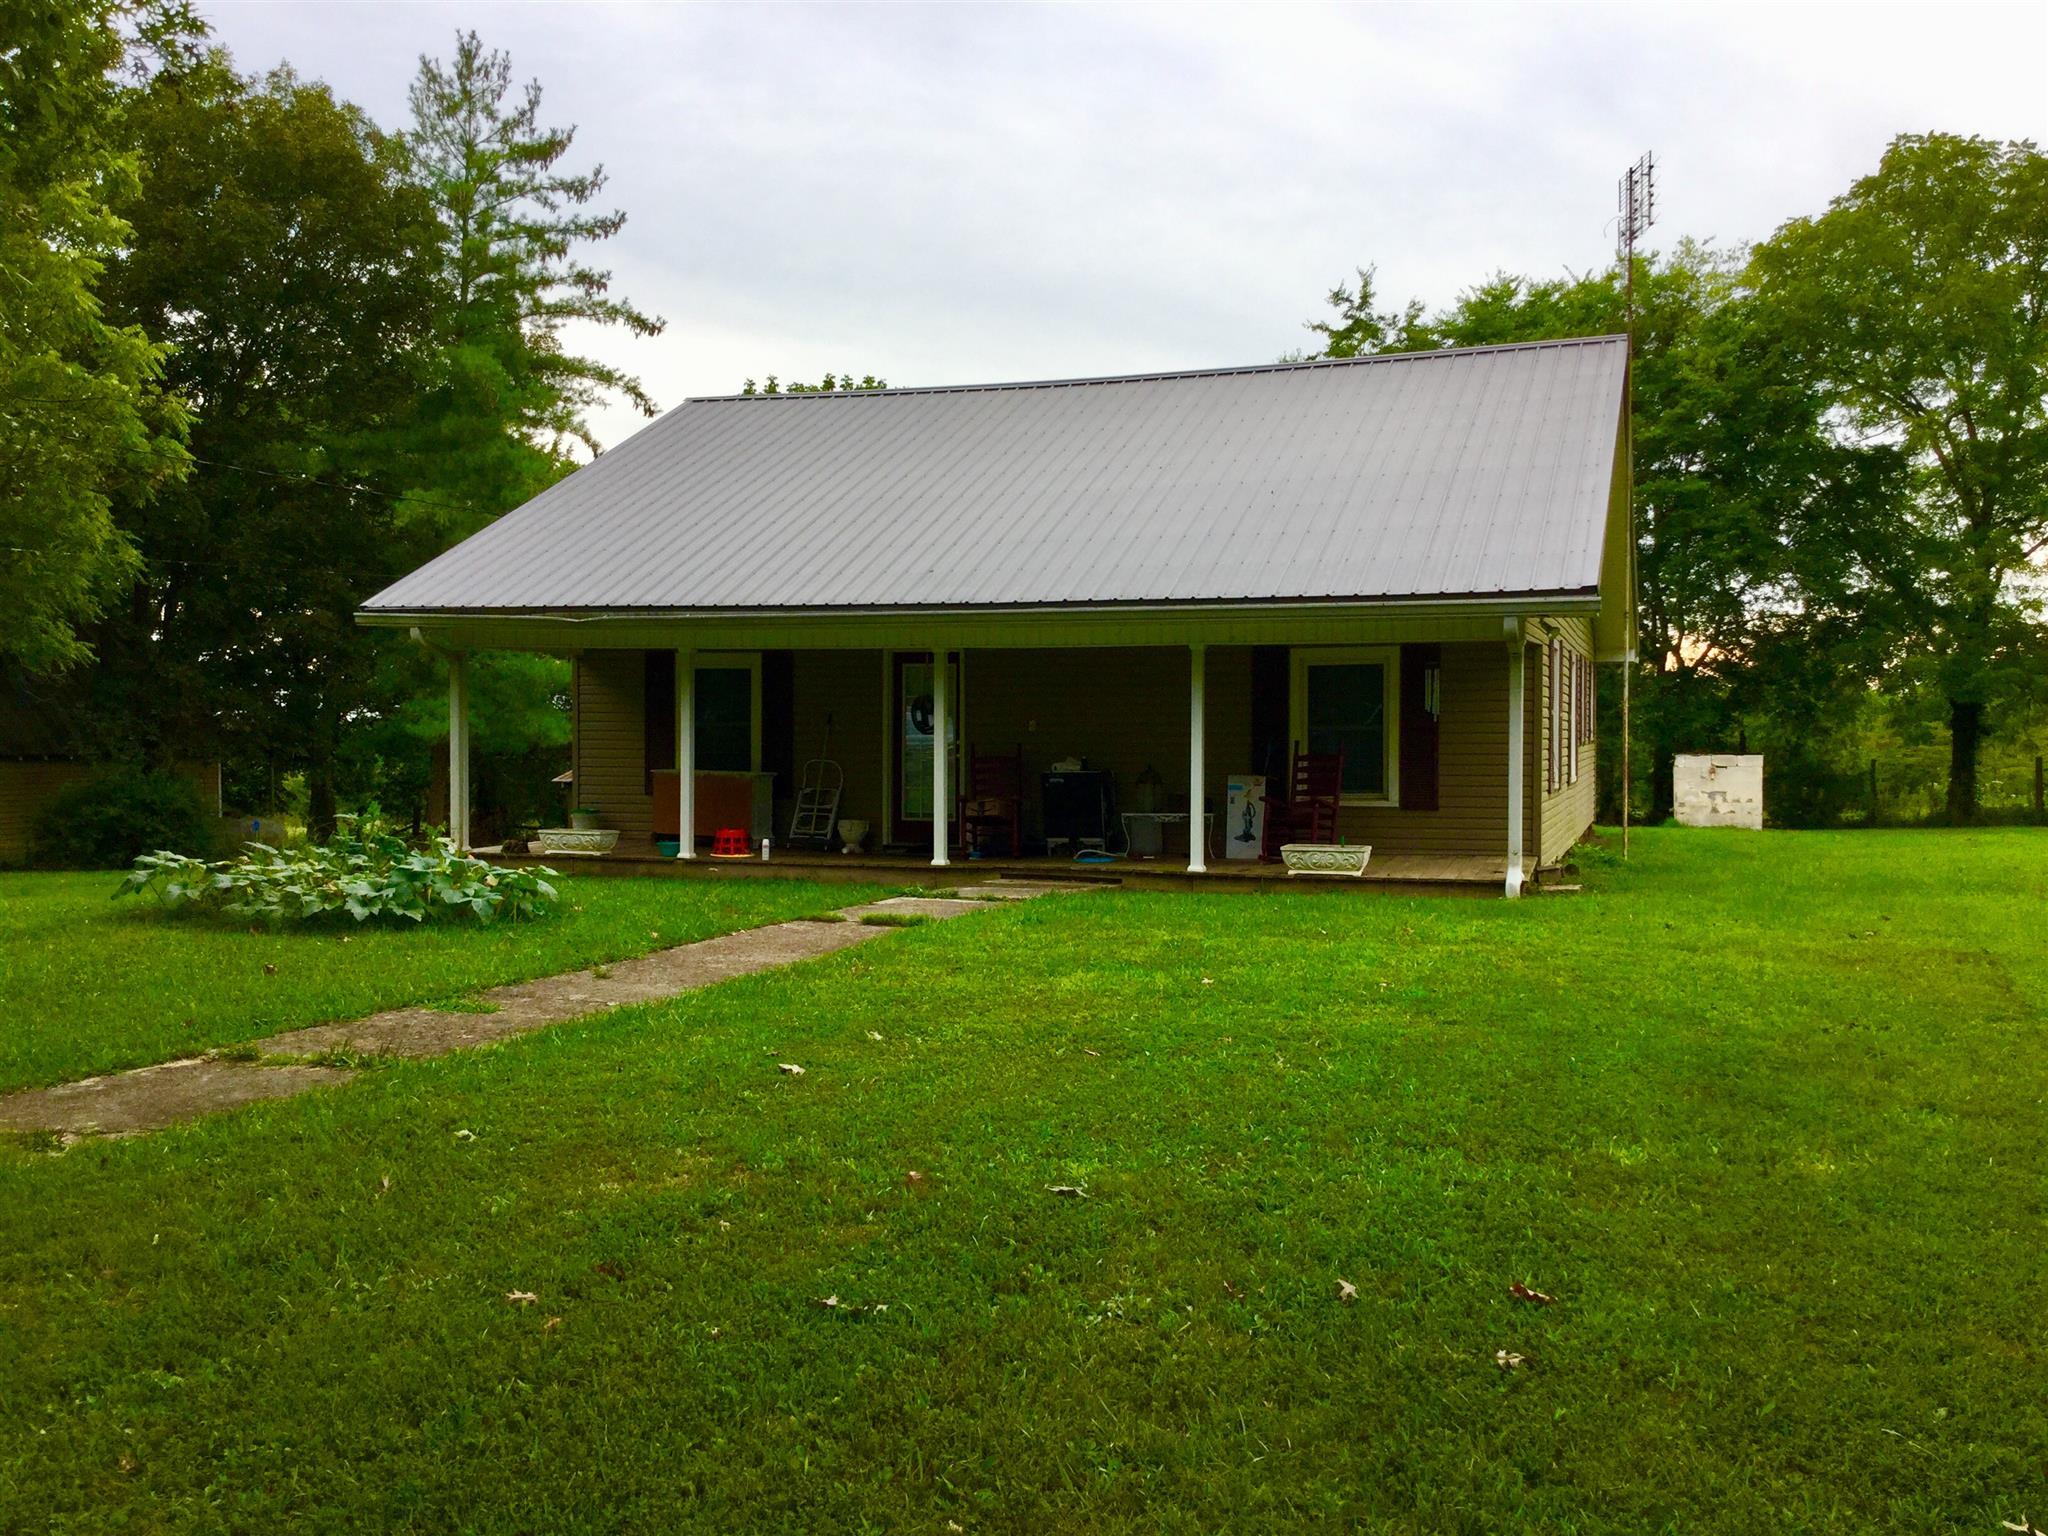 397 Roy Moore Rd, Unionville, TN 37180 - Unionville, TN real estate listing